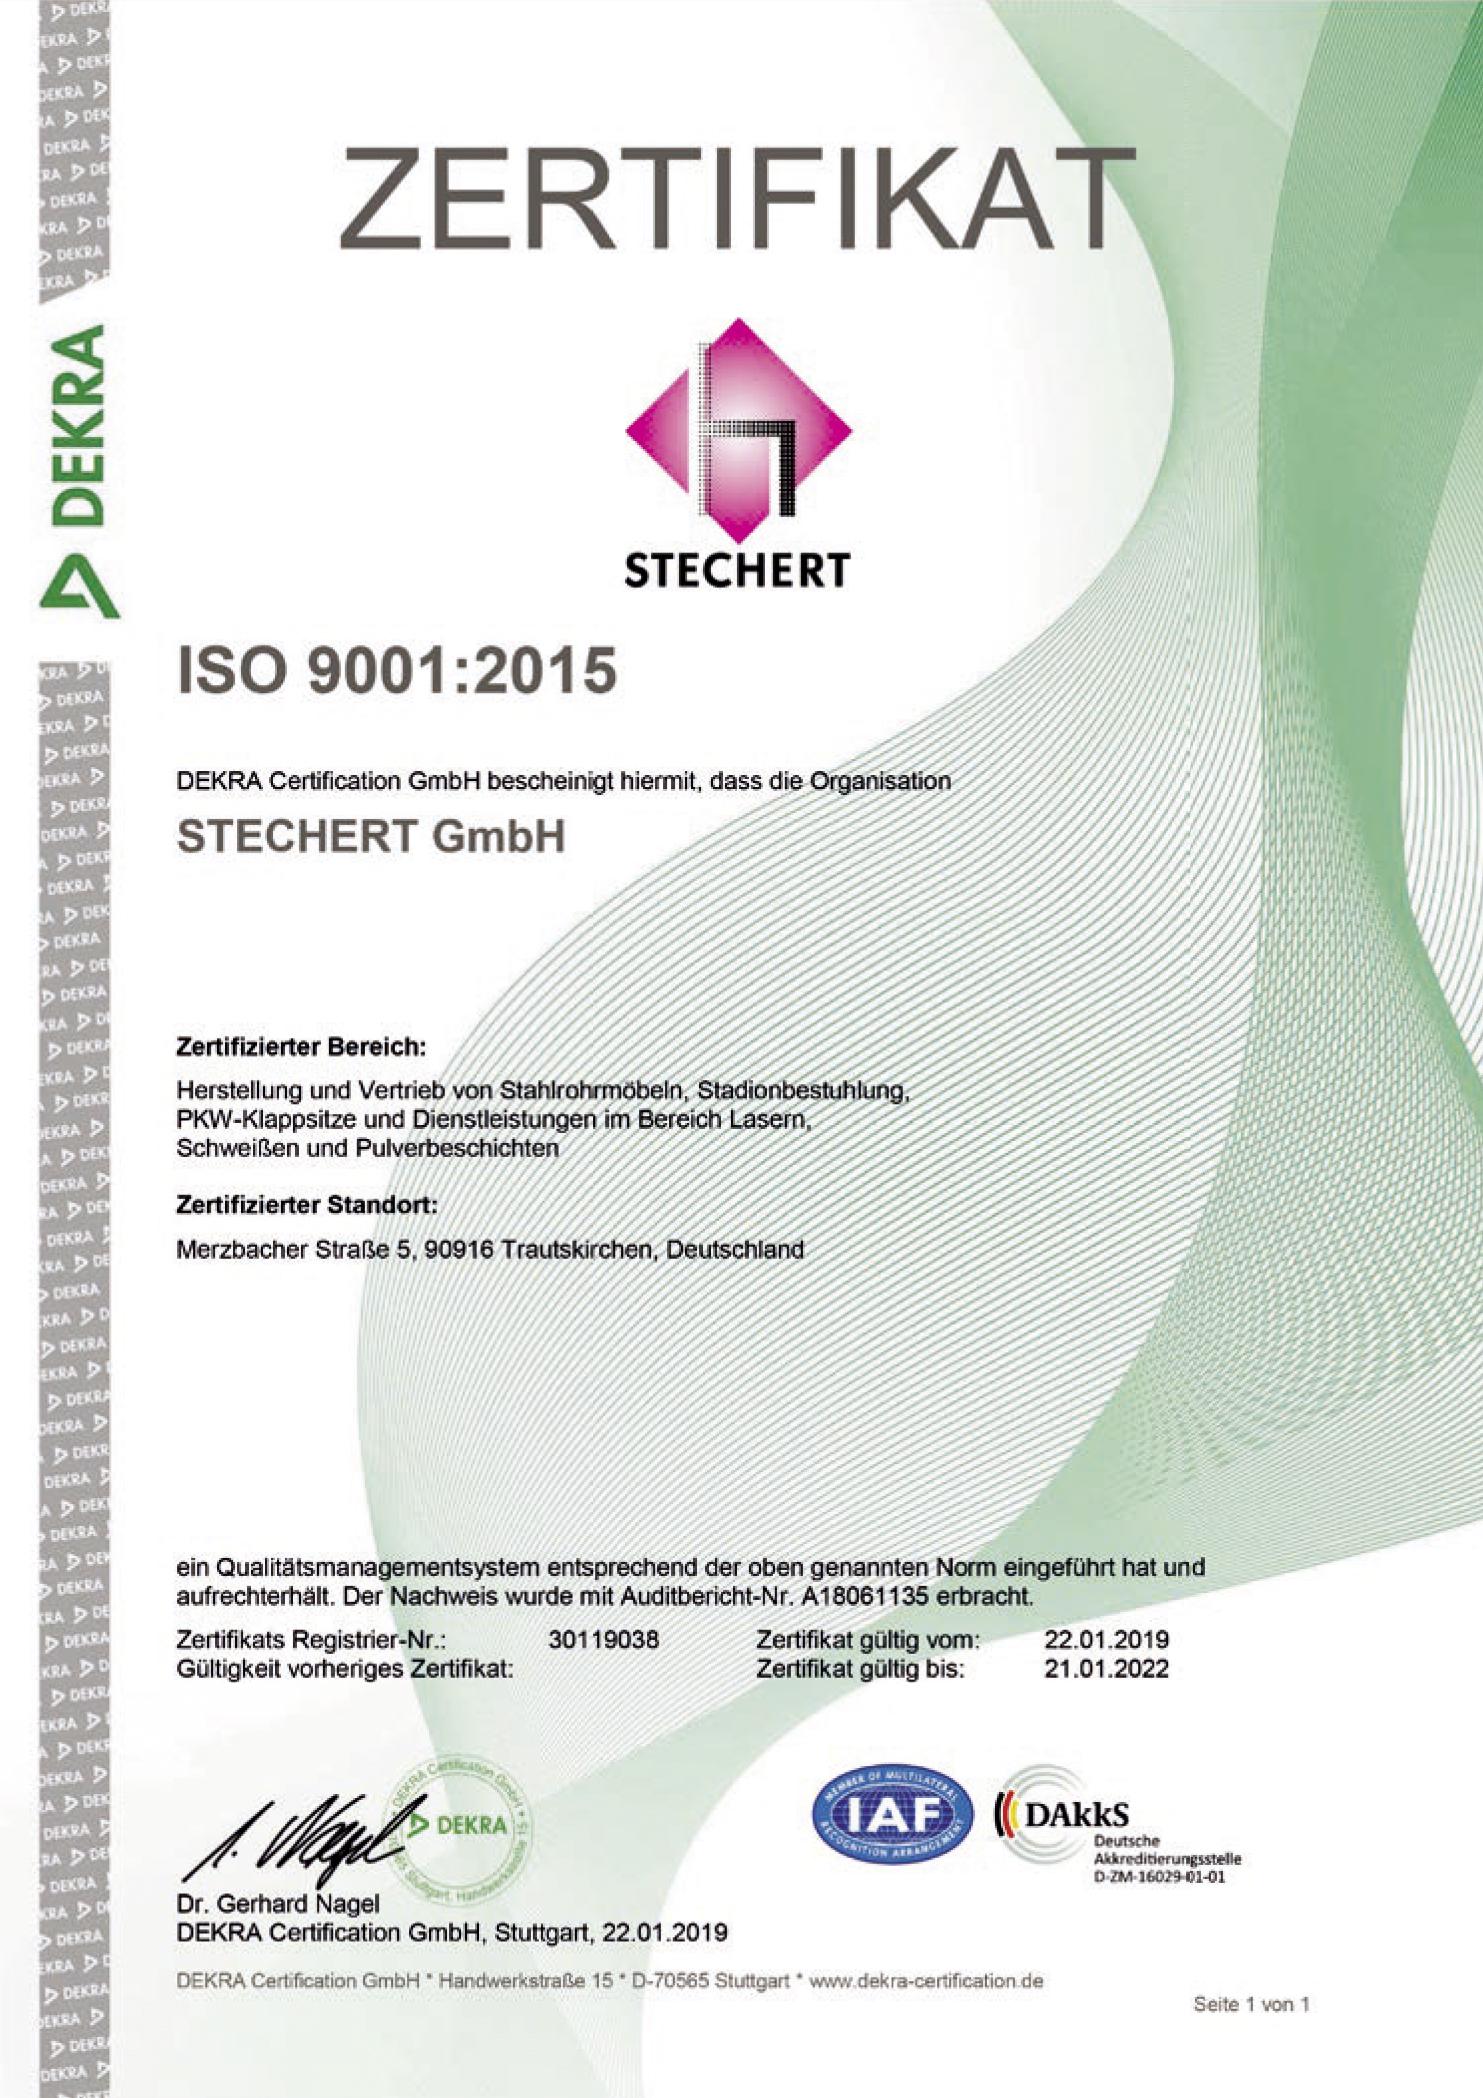 DEKRA Zertifikat ISO 9001